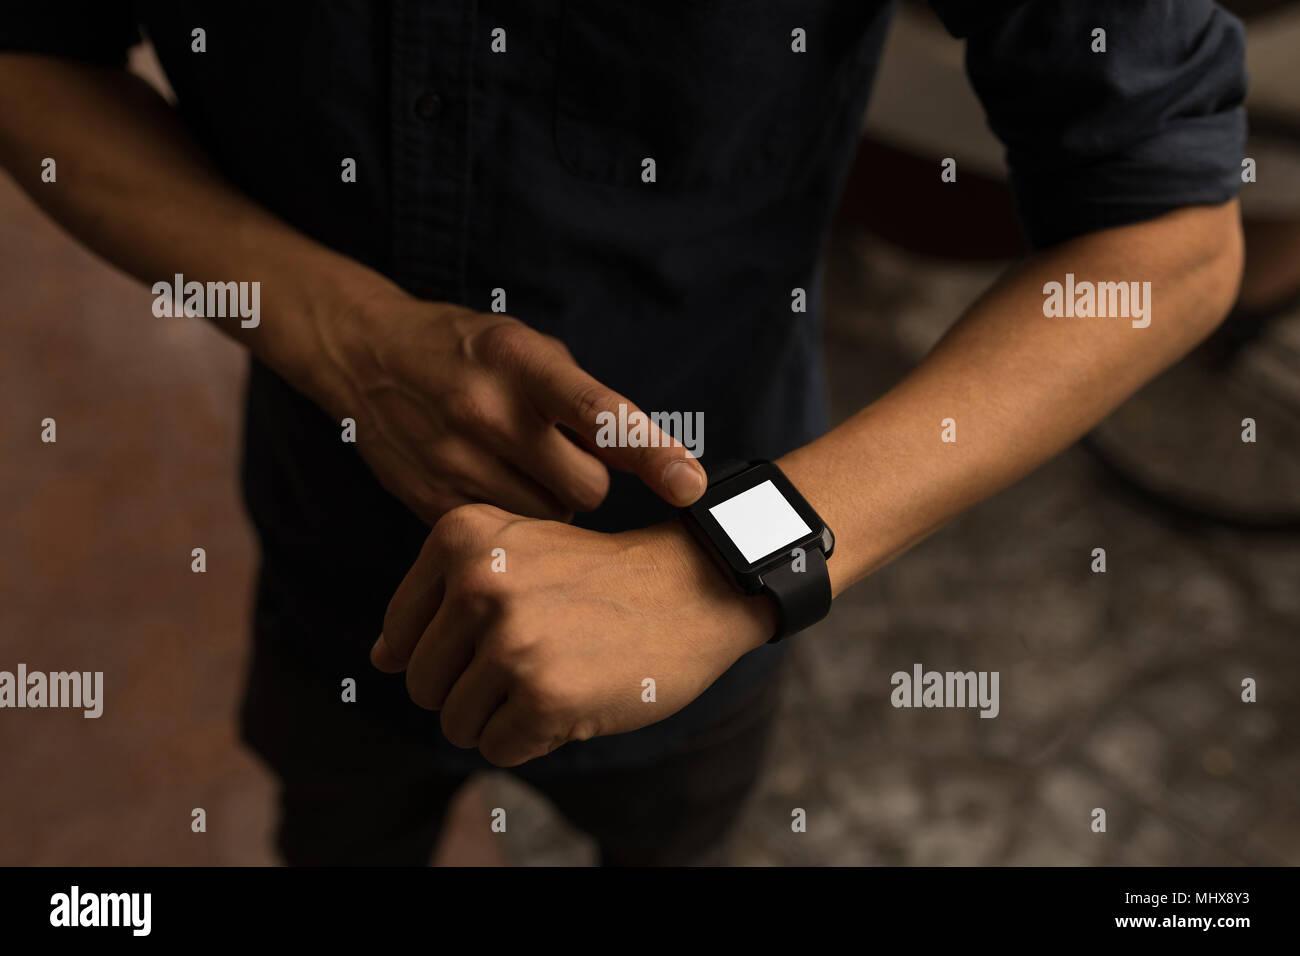 Businessman using smartwatch - Stock Image